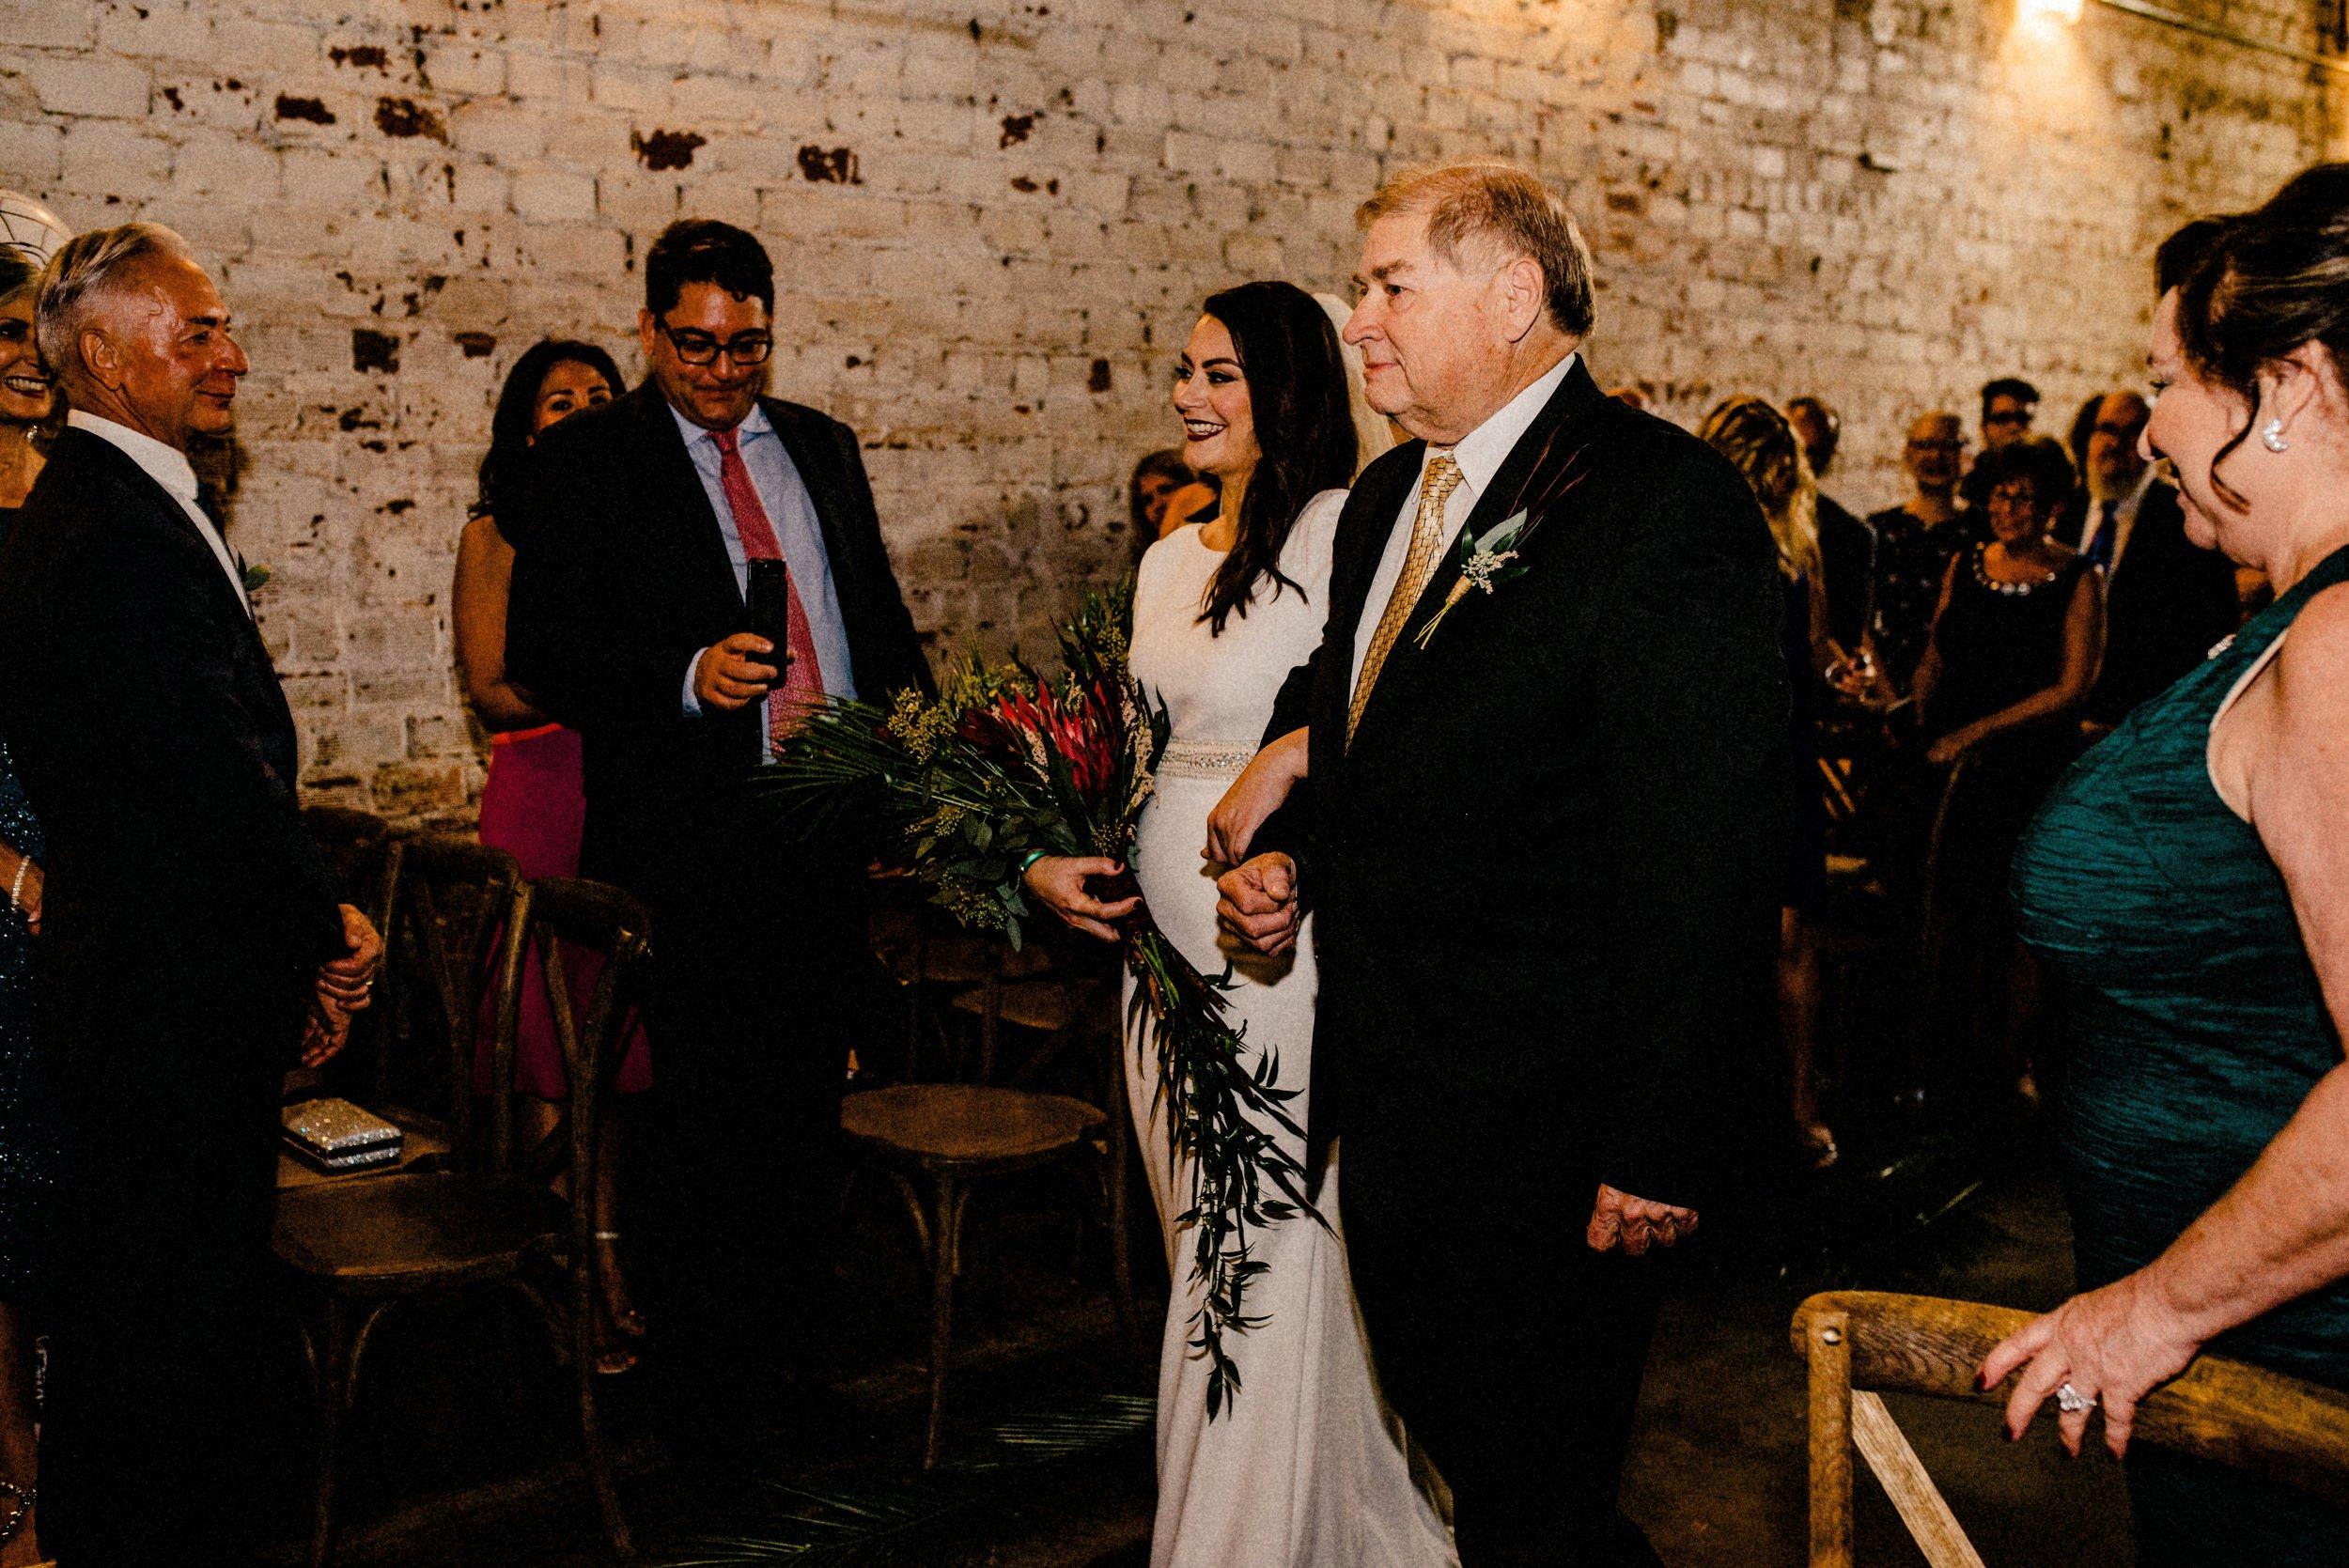 Denee-Leo-Tampa-Florida-Wedding-Rialto-Theatre-278.jpg